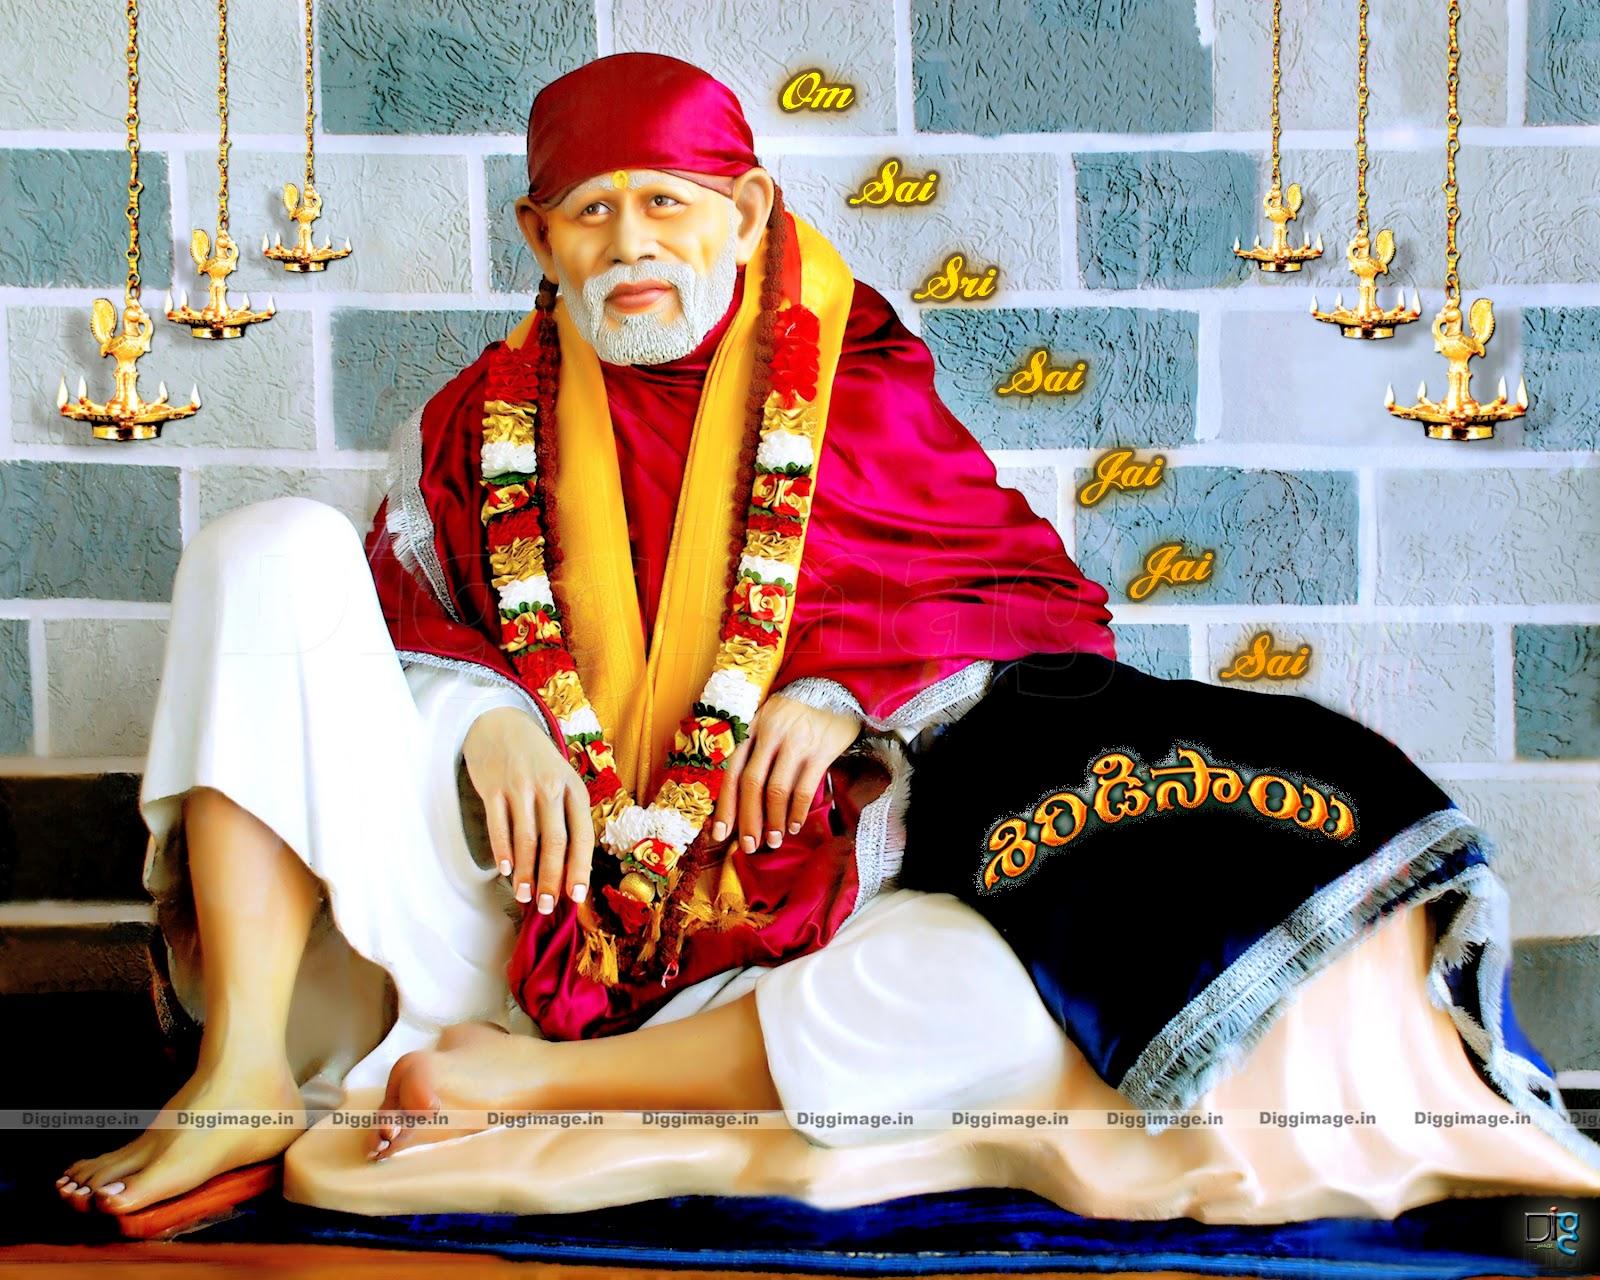 Exclusive Full Screen Sai Baba Om Sai Sri Sai Jai Jai Sai Wallpaper Free Download In Hd D I G G I M A G E